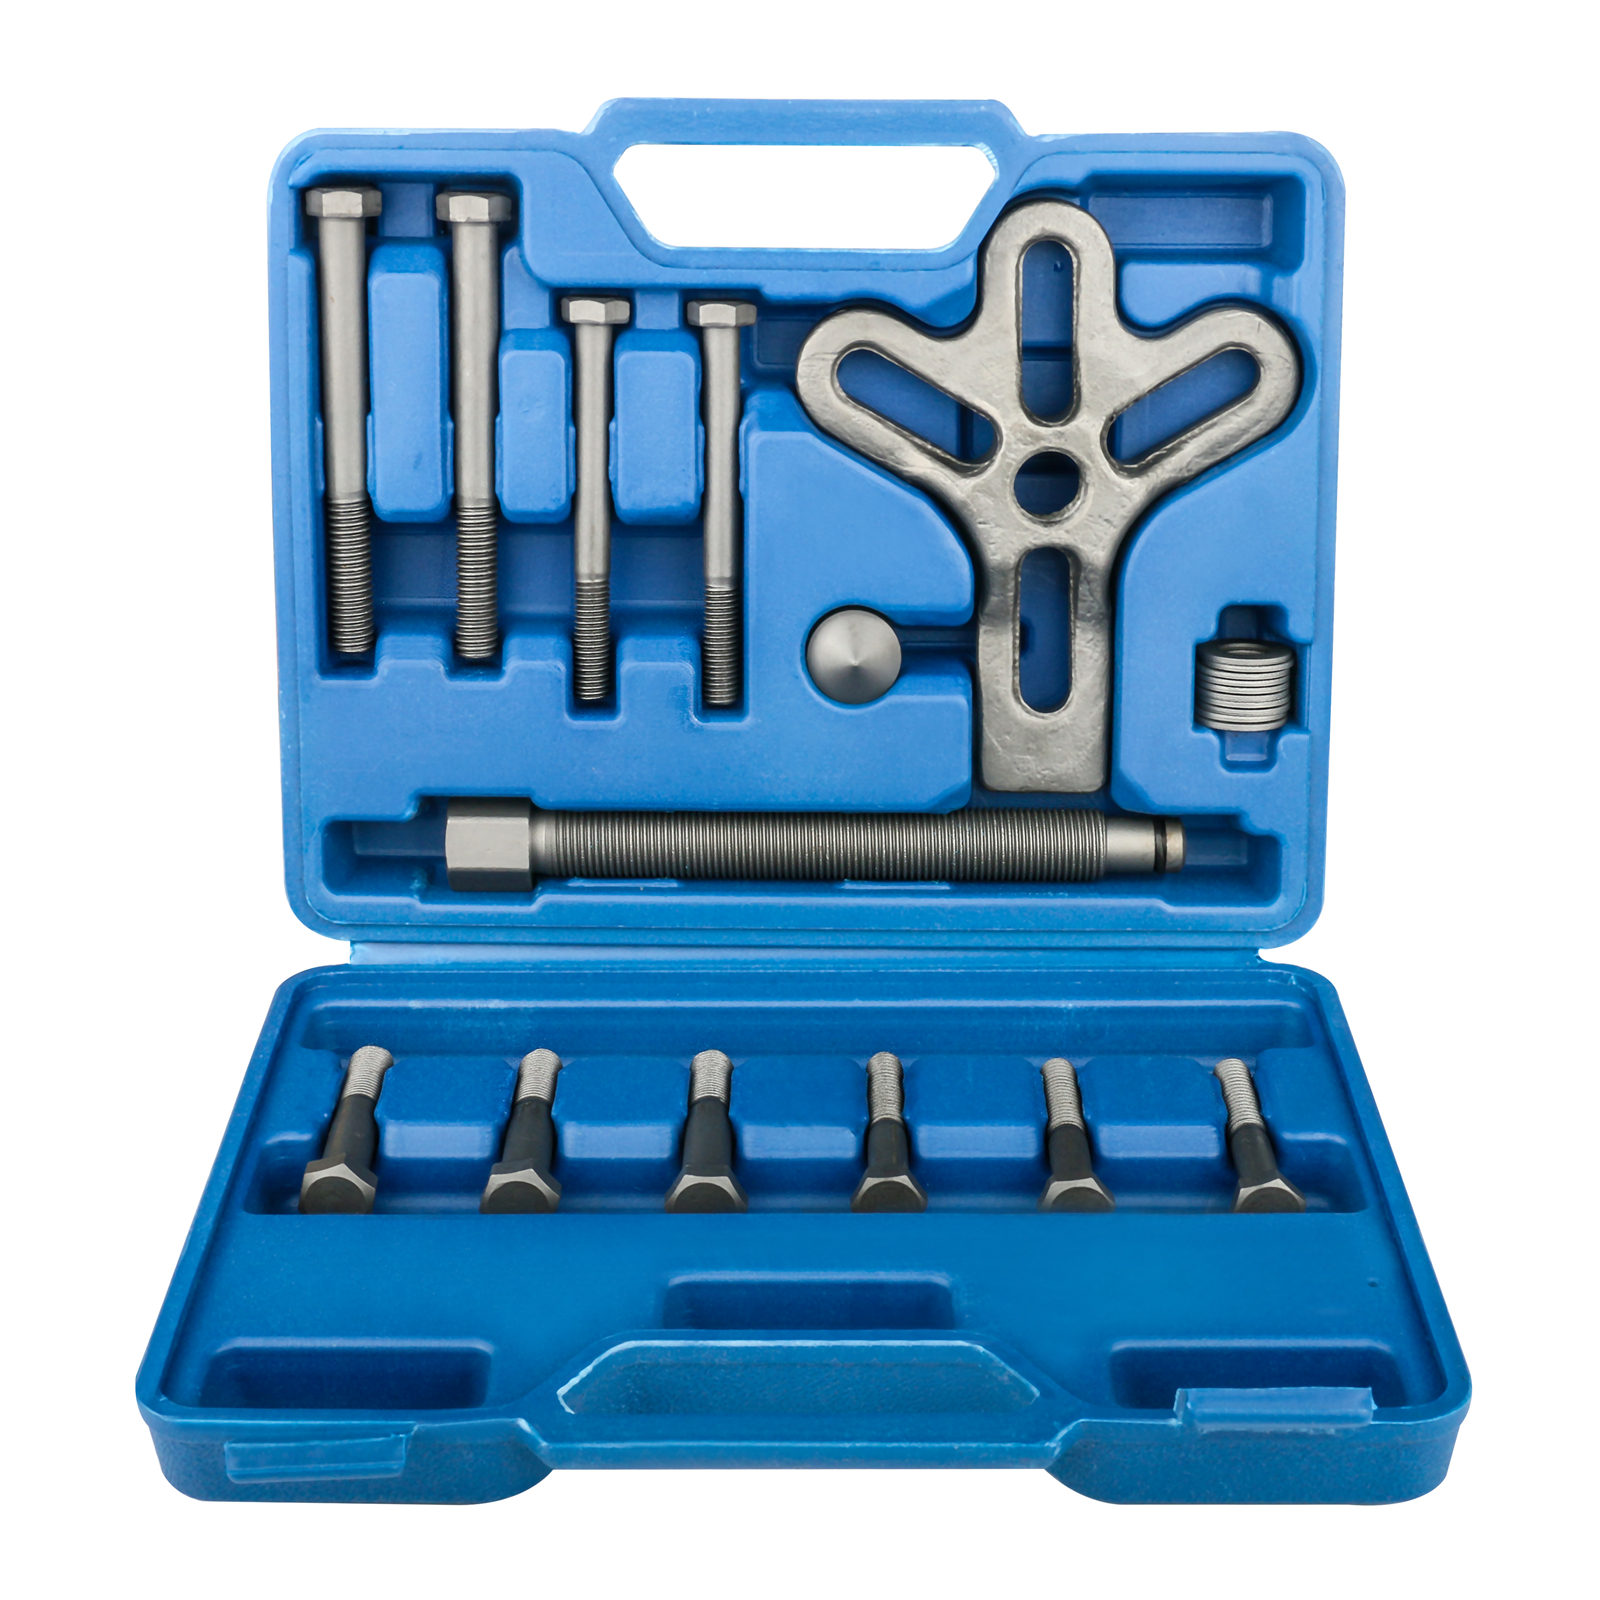 13 PCS High-Quality Steel Automotive Tool Set  Harmonic Balancer Steering Wheel Puller Repair Kit Disassembly Removal Tool Set